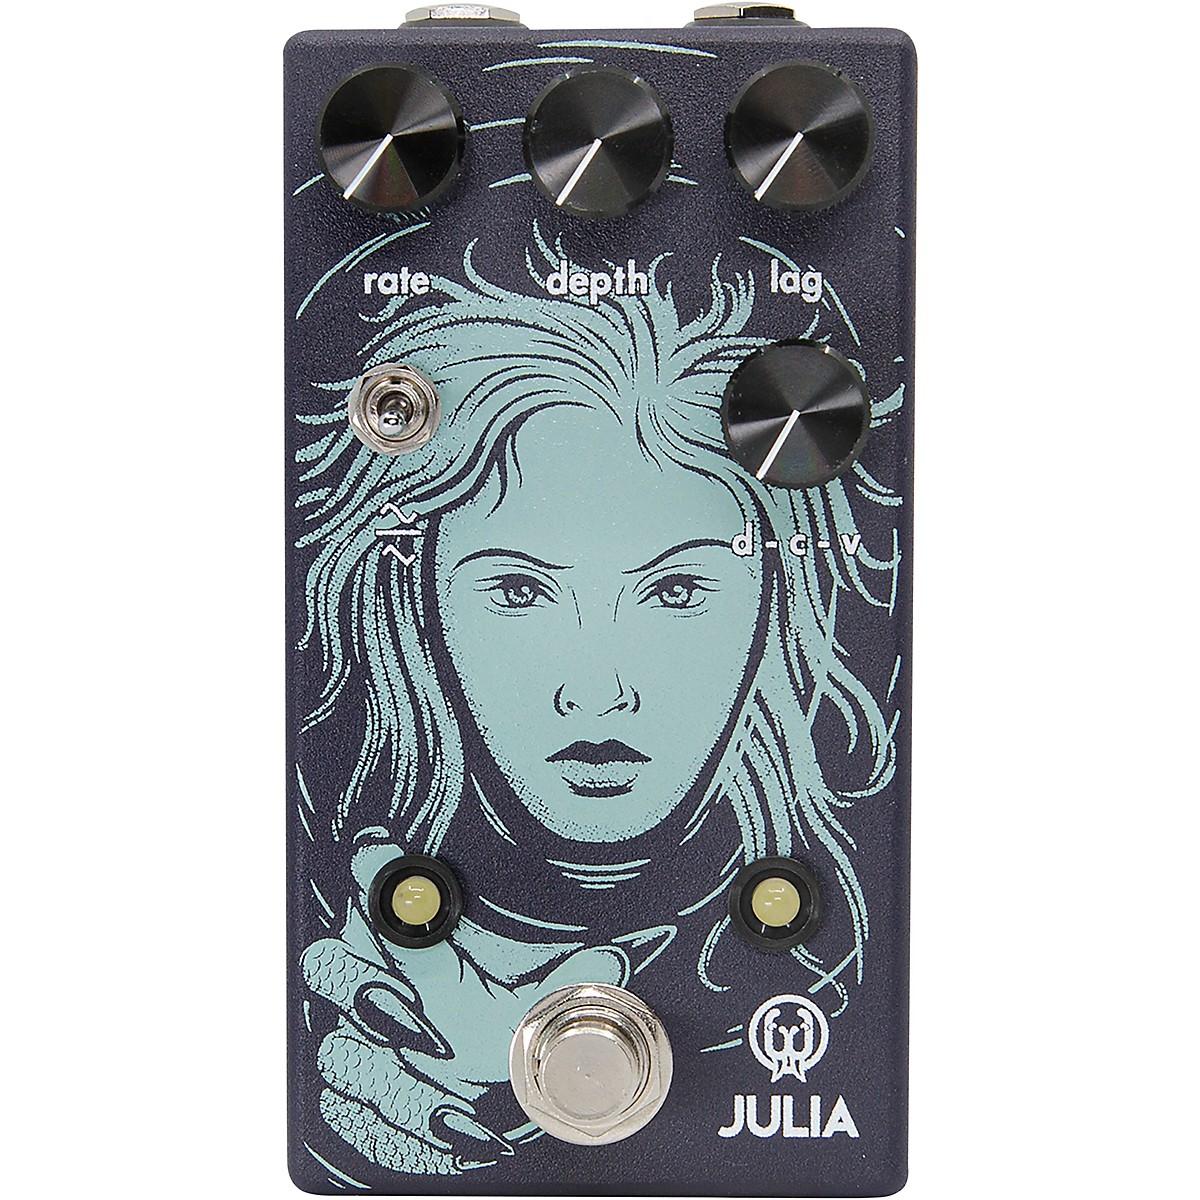 Walrus Audio Julia Analog Chorus/Vibrato V2 Effects Pedal